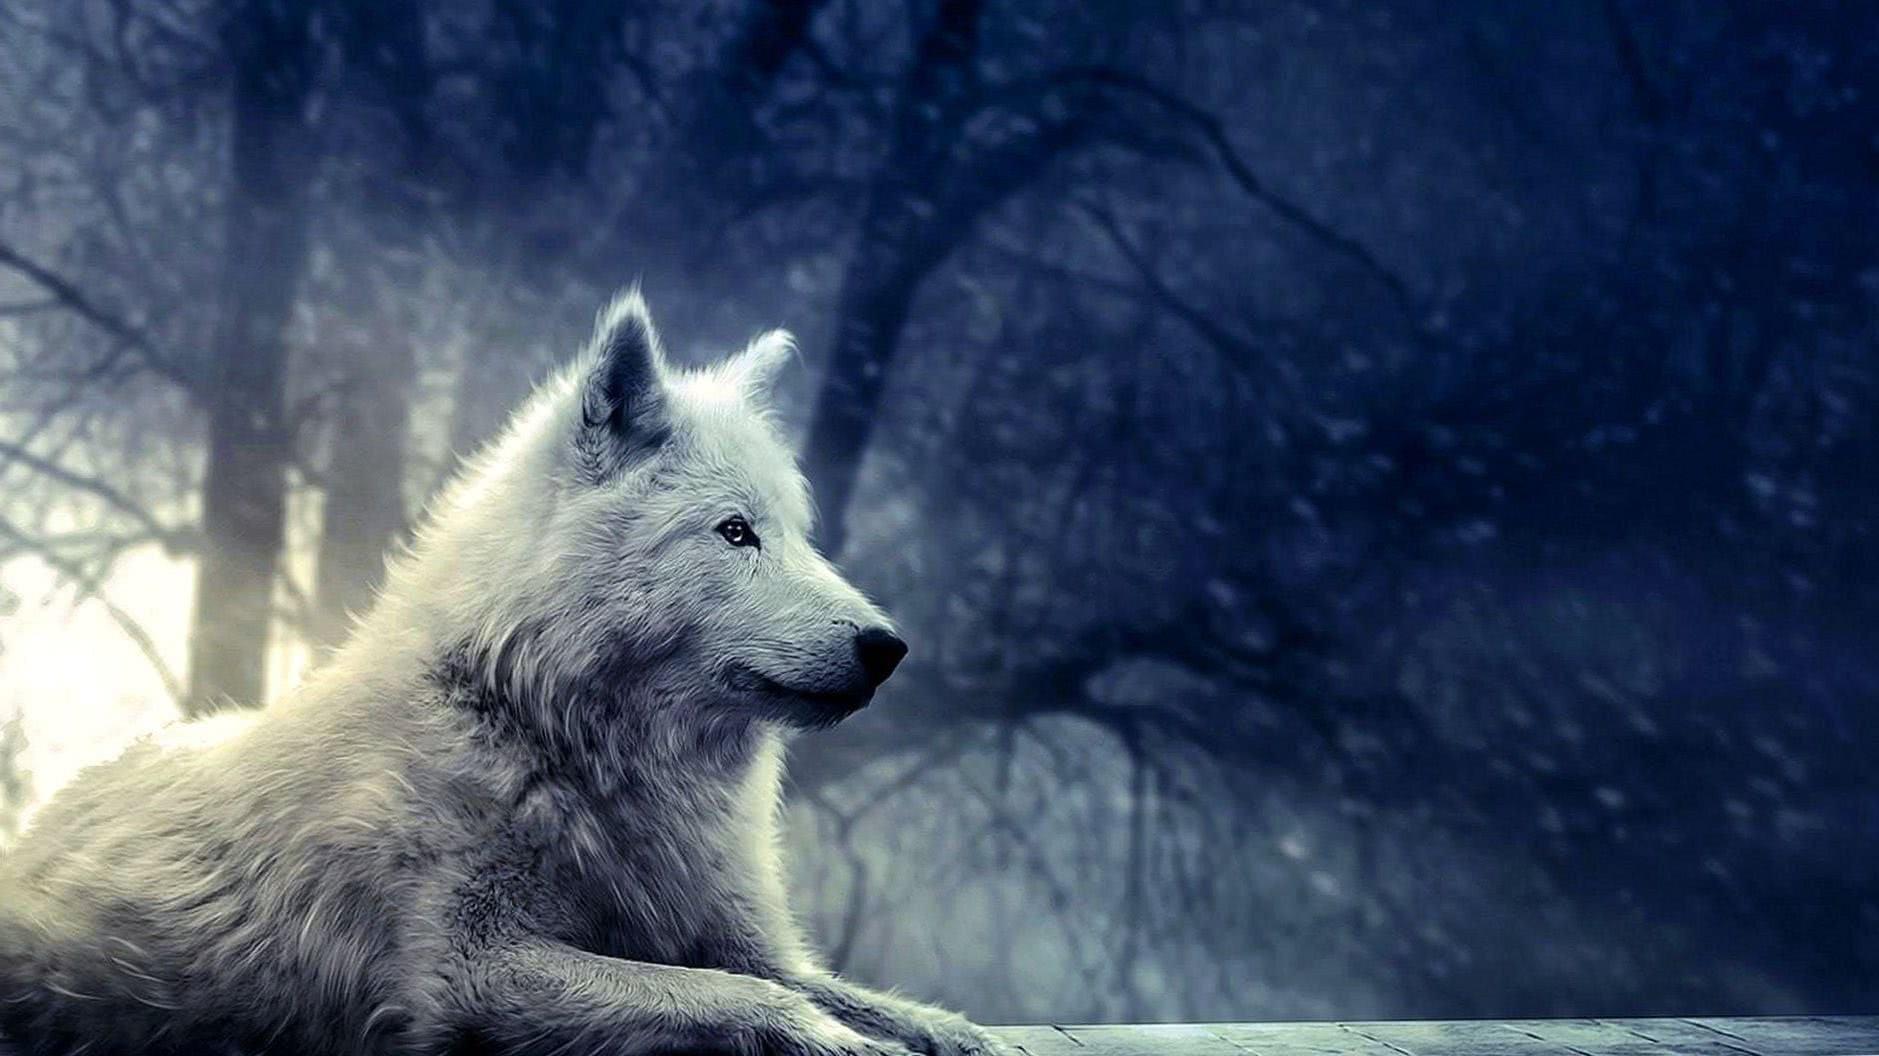 Wolf HD Wallpapers For Desktop